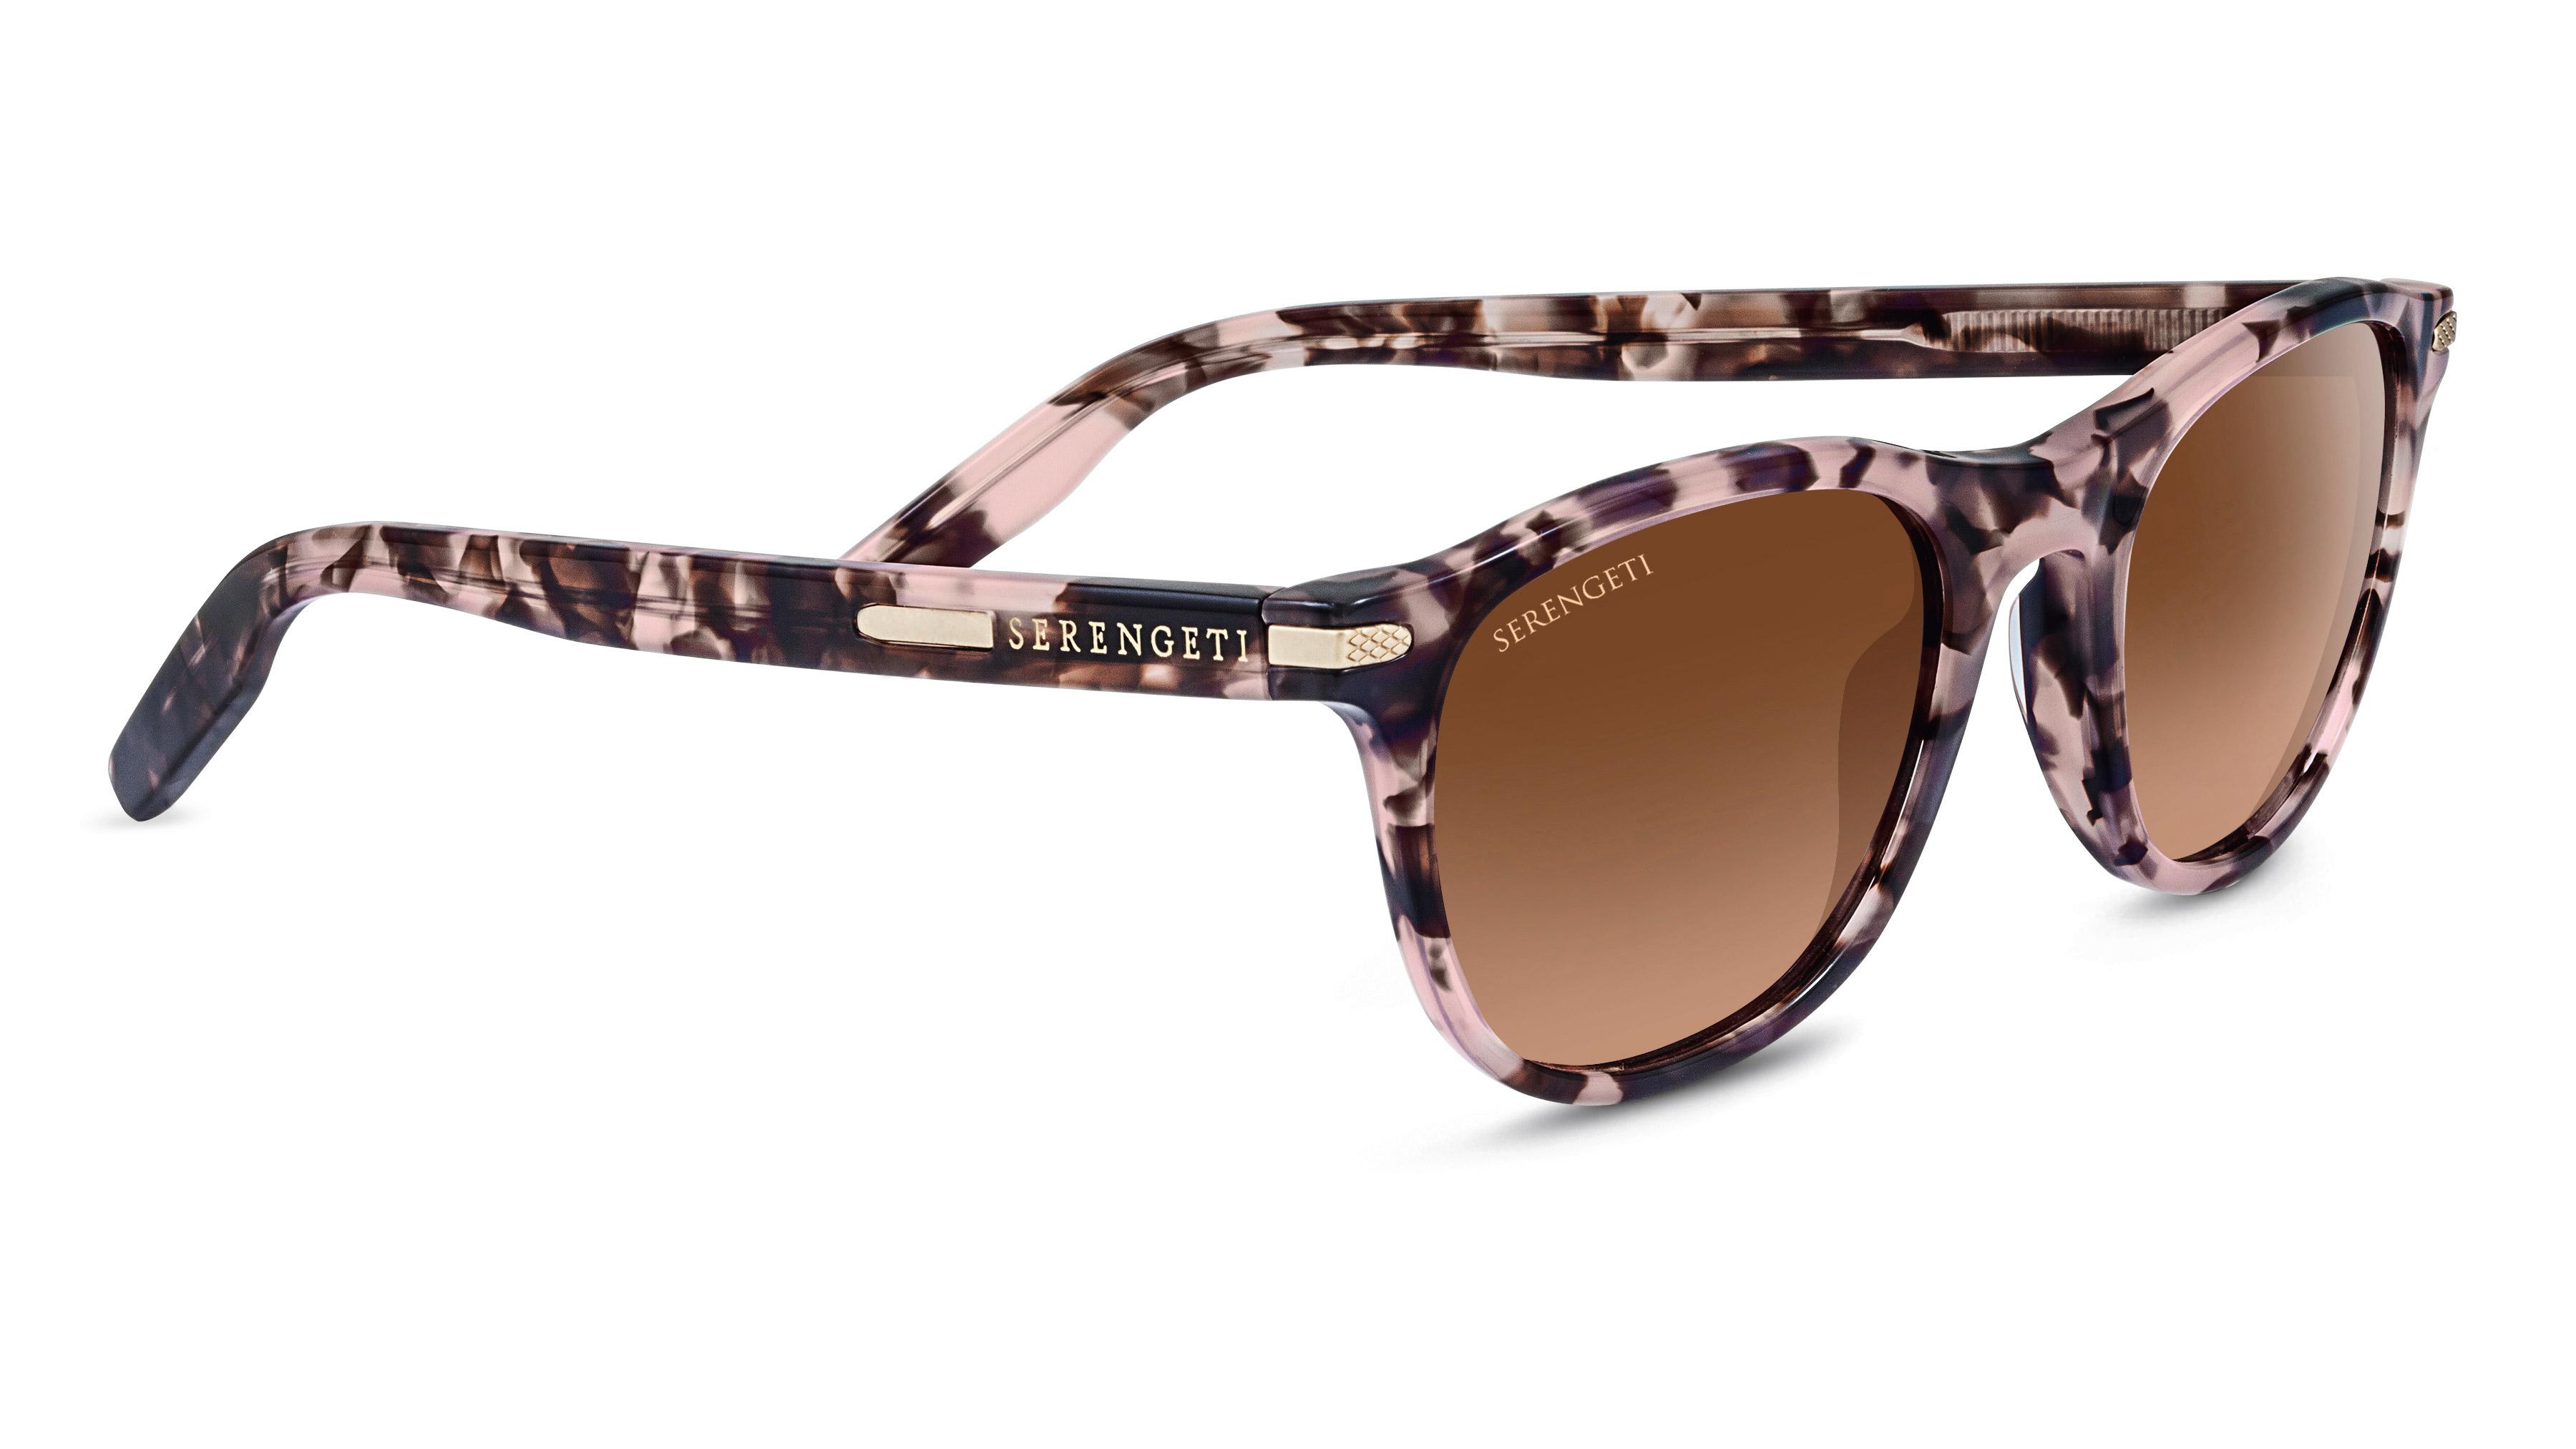 838bee6ade Serengeti Andrea Sunglasses